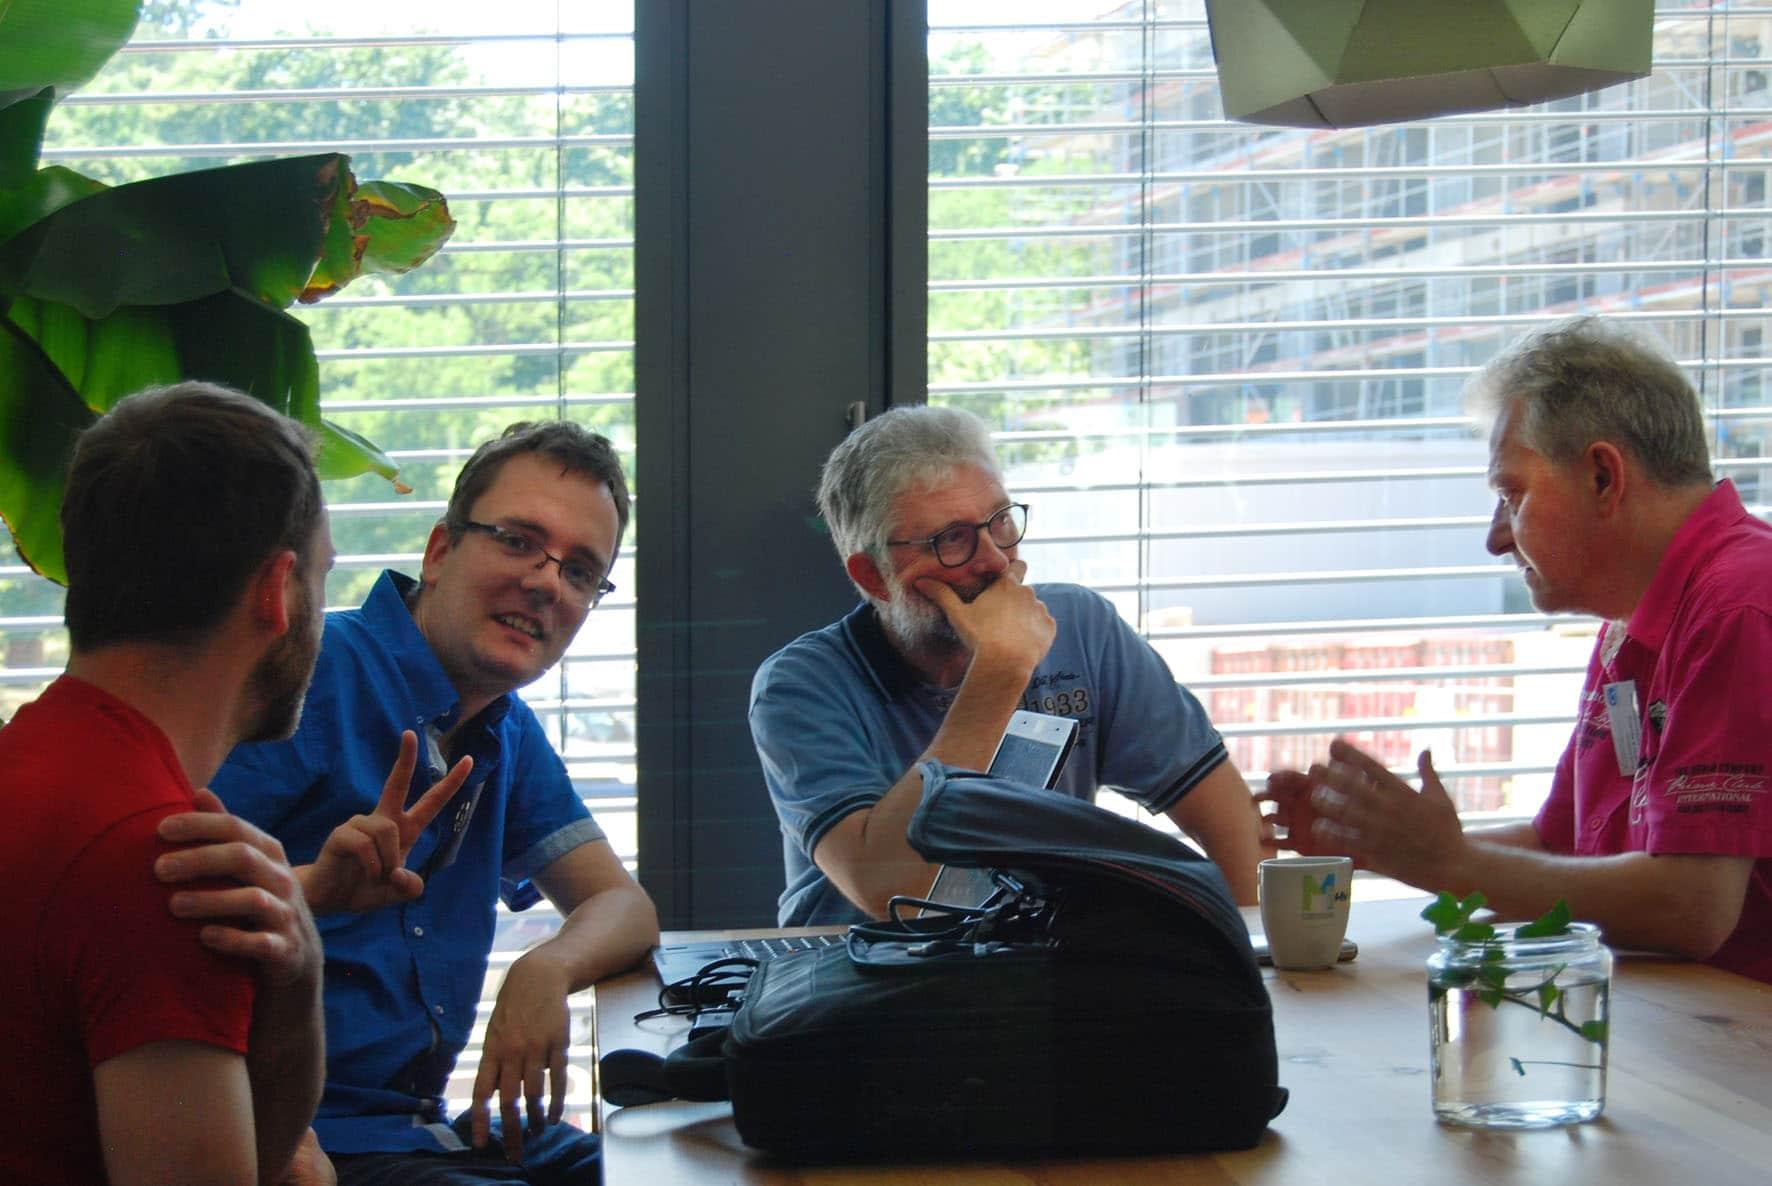 Maik Huettner und Stefan Werfling im Coworking Space